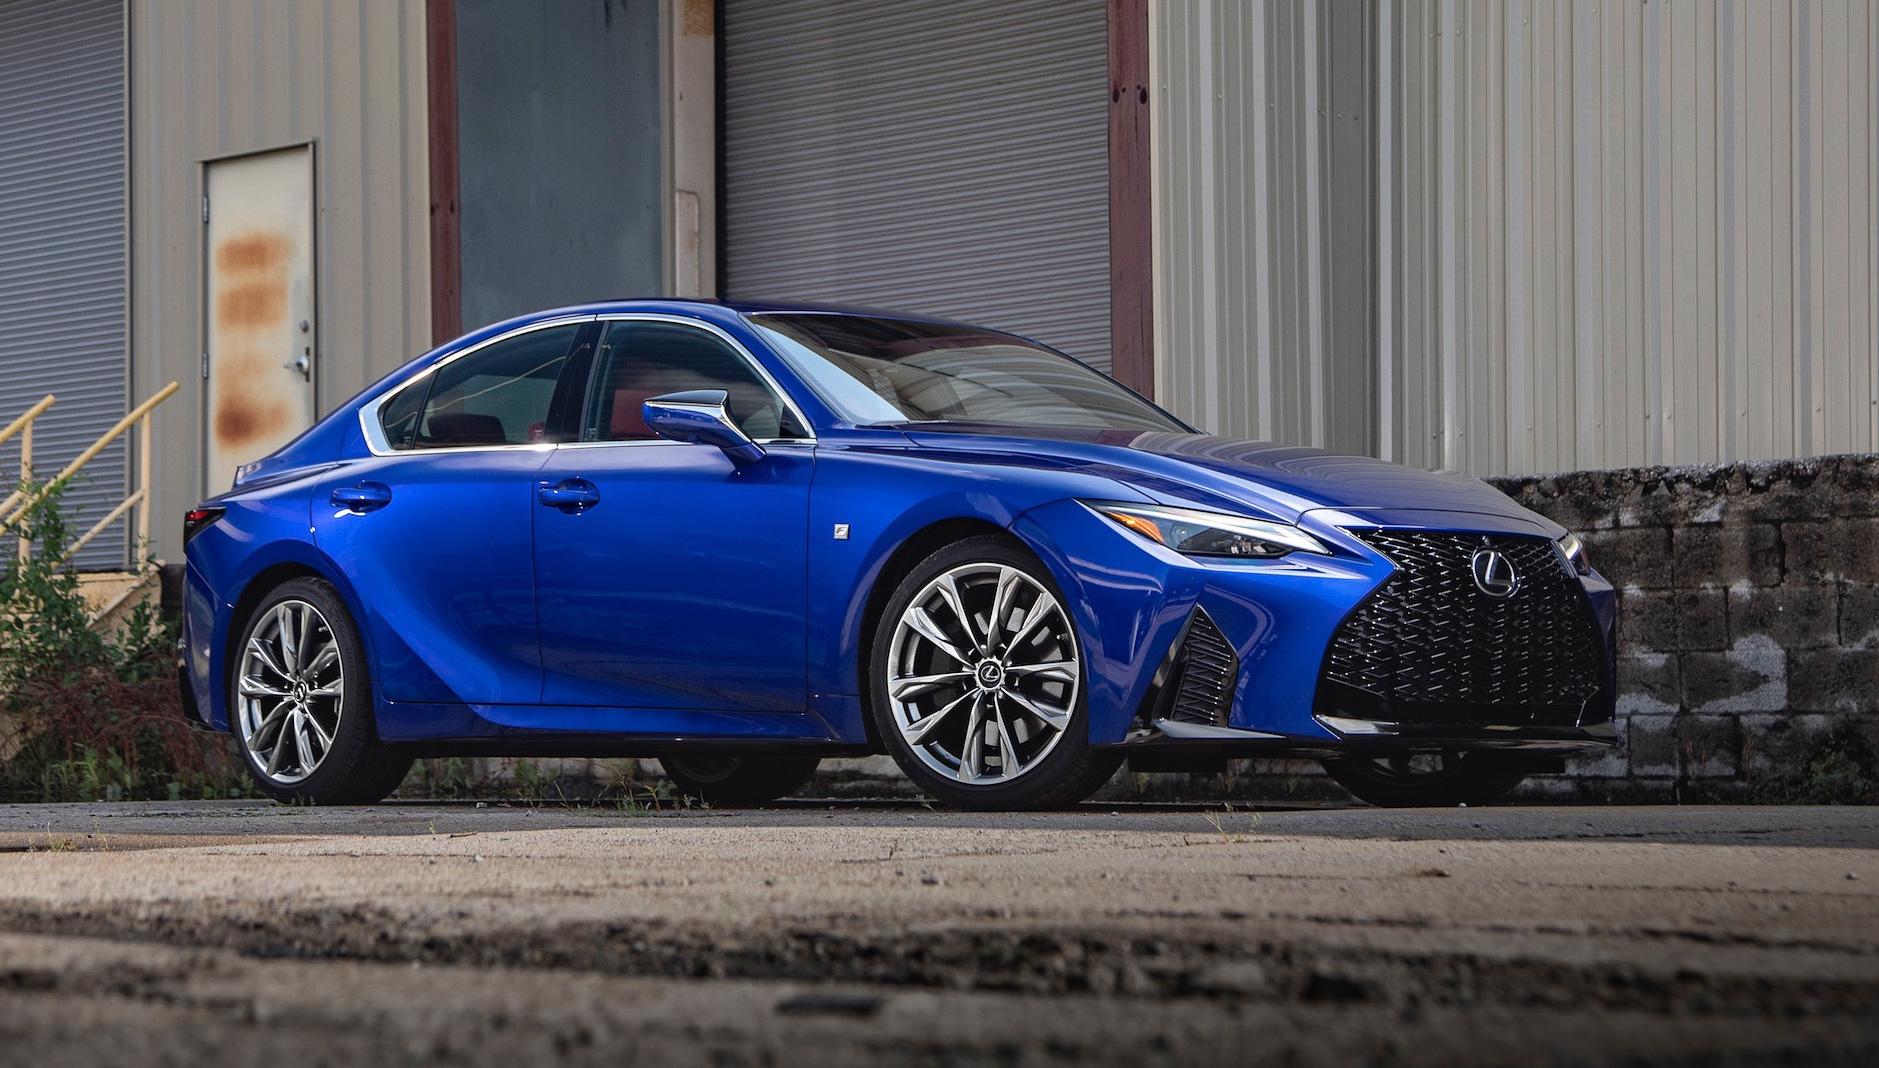 2021 Lexus IS on sale in Australia from $61,500, lands November 6